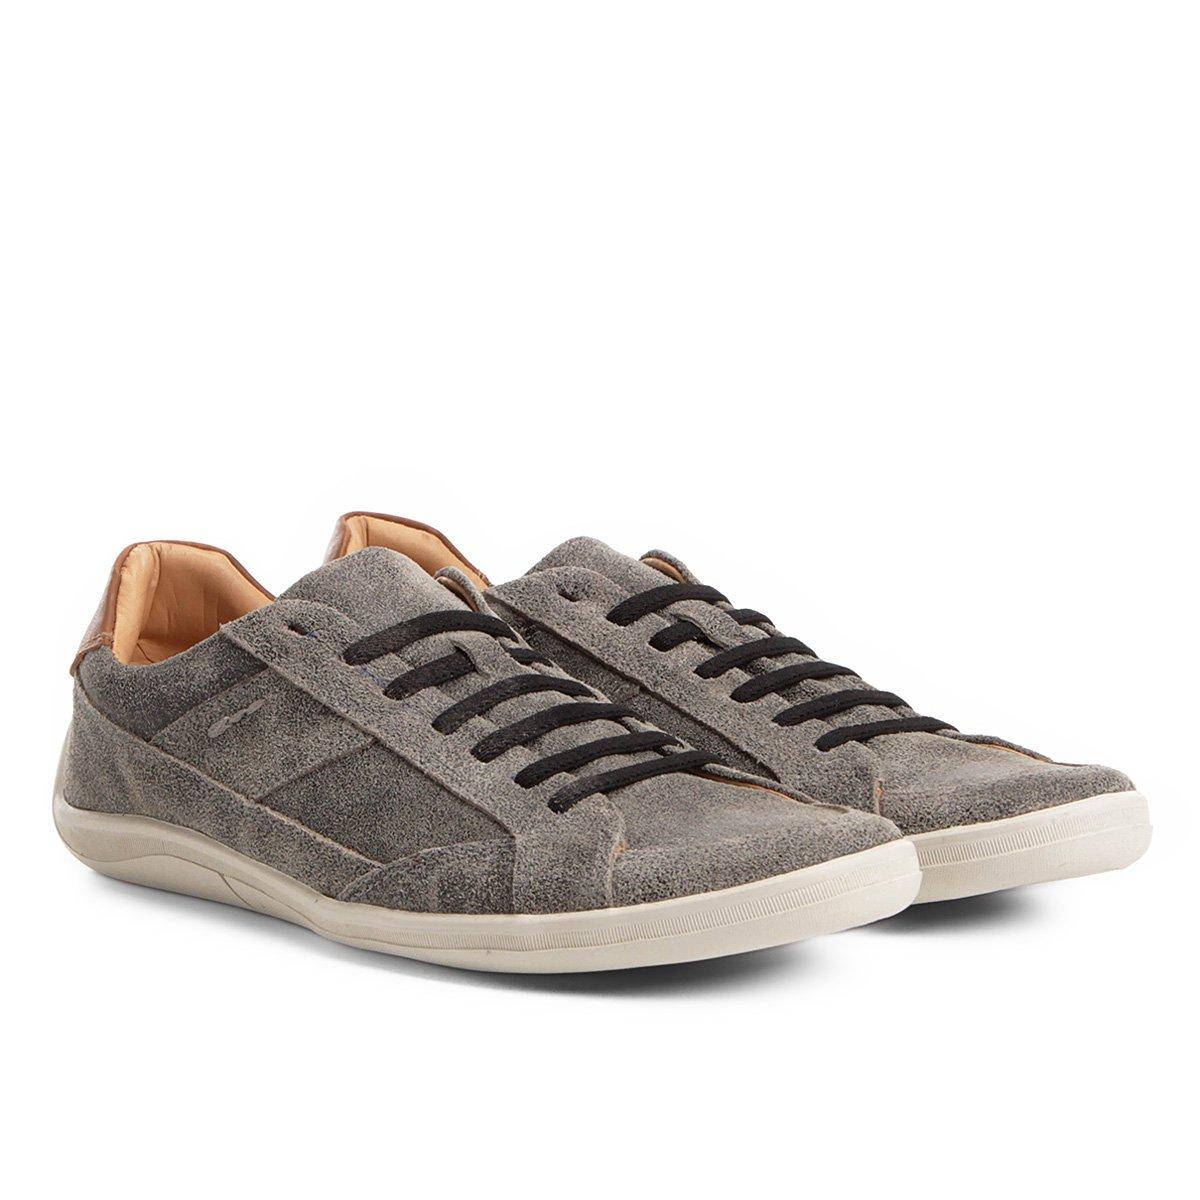 687feb1bf Sapatênis Couro Shoestock Lixado Masculino   Shoestock